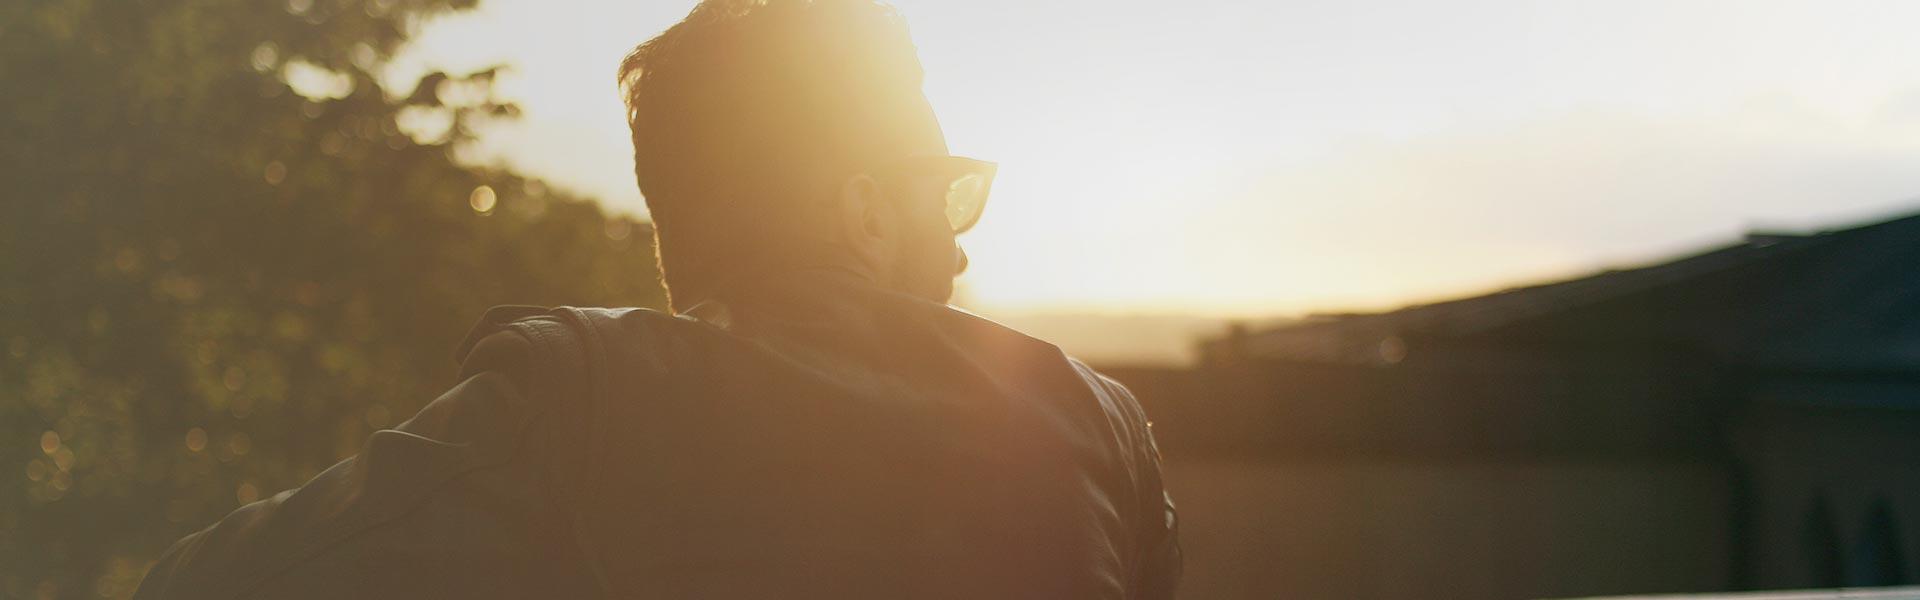 Man enjoying a sunset 2 | Fon